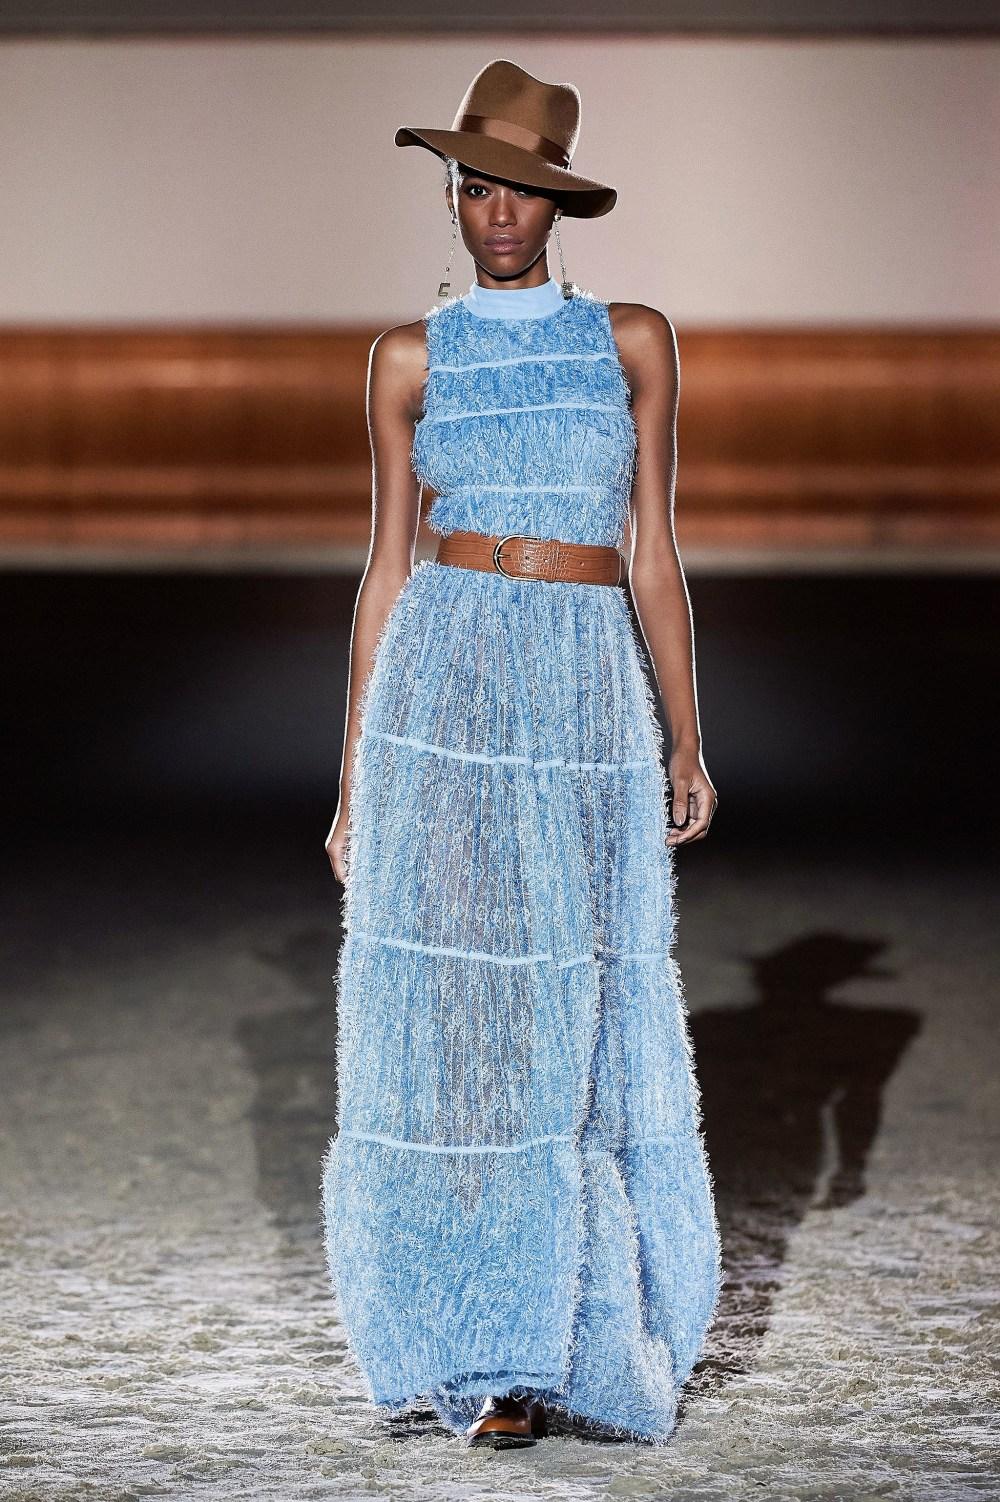 Elisabetta Franchi: Elisabetta Franchi Fall Winter 2021-22 Fashion Show Photo #10